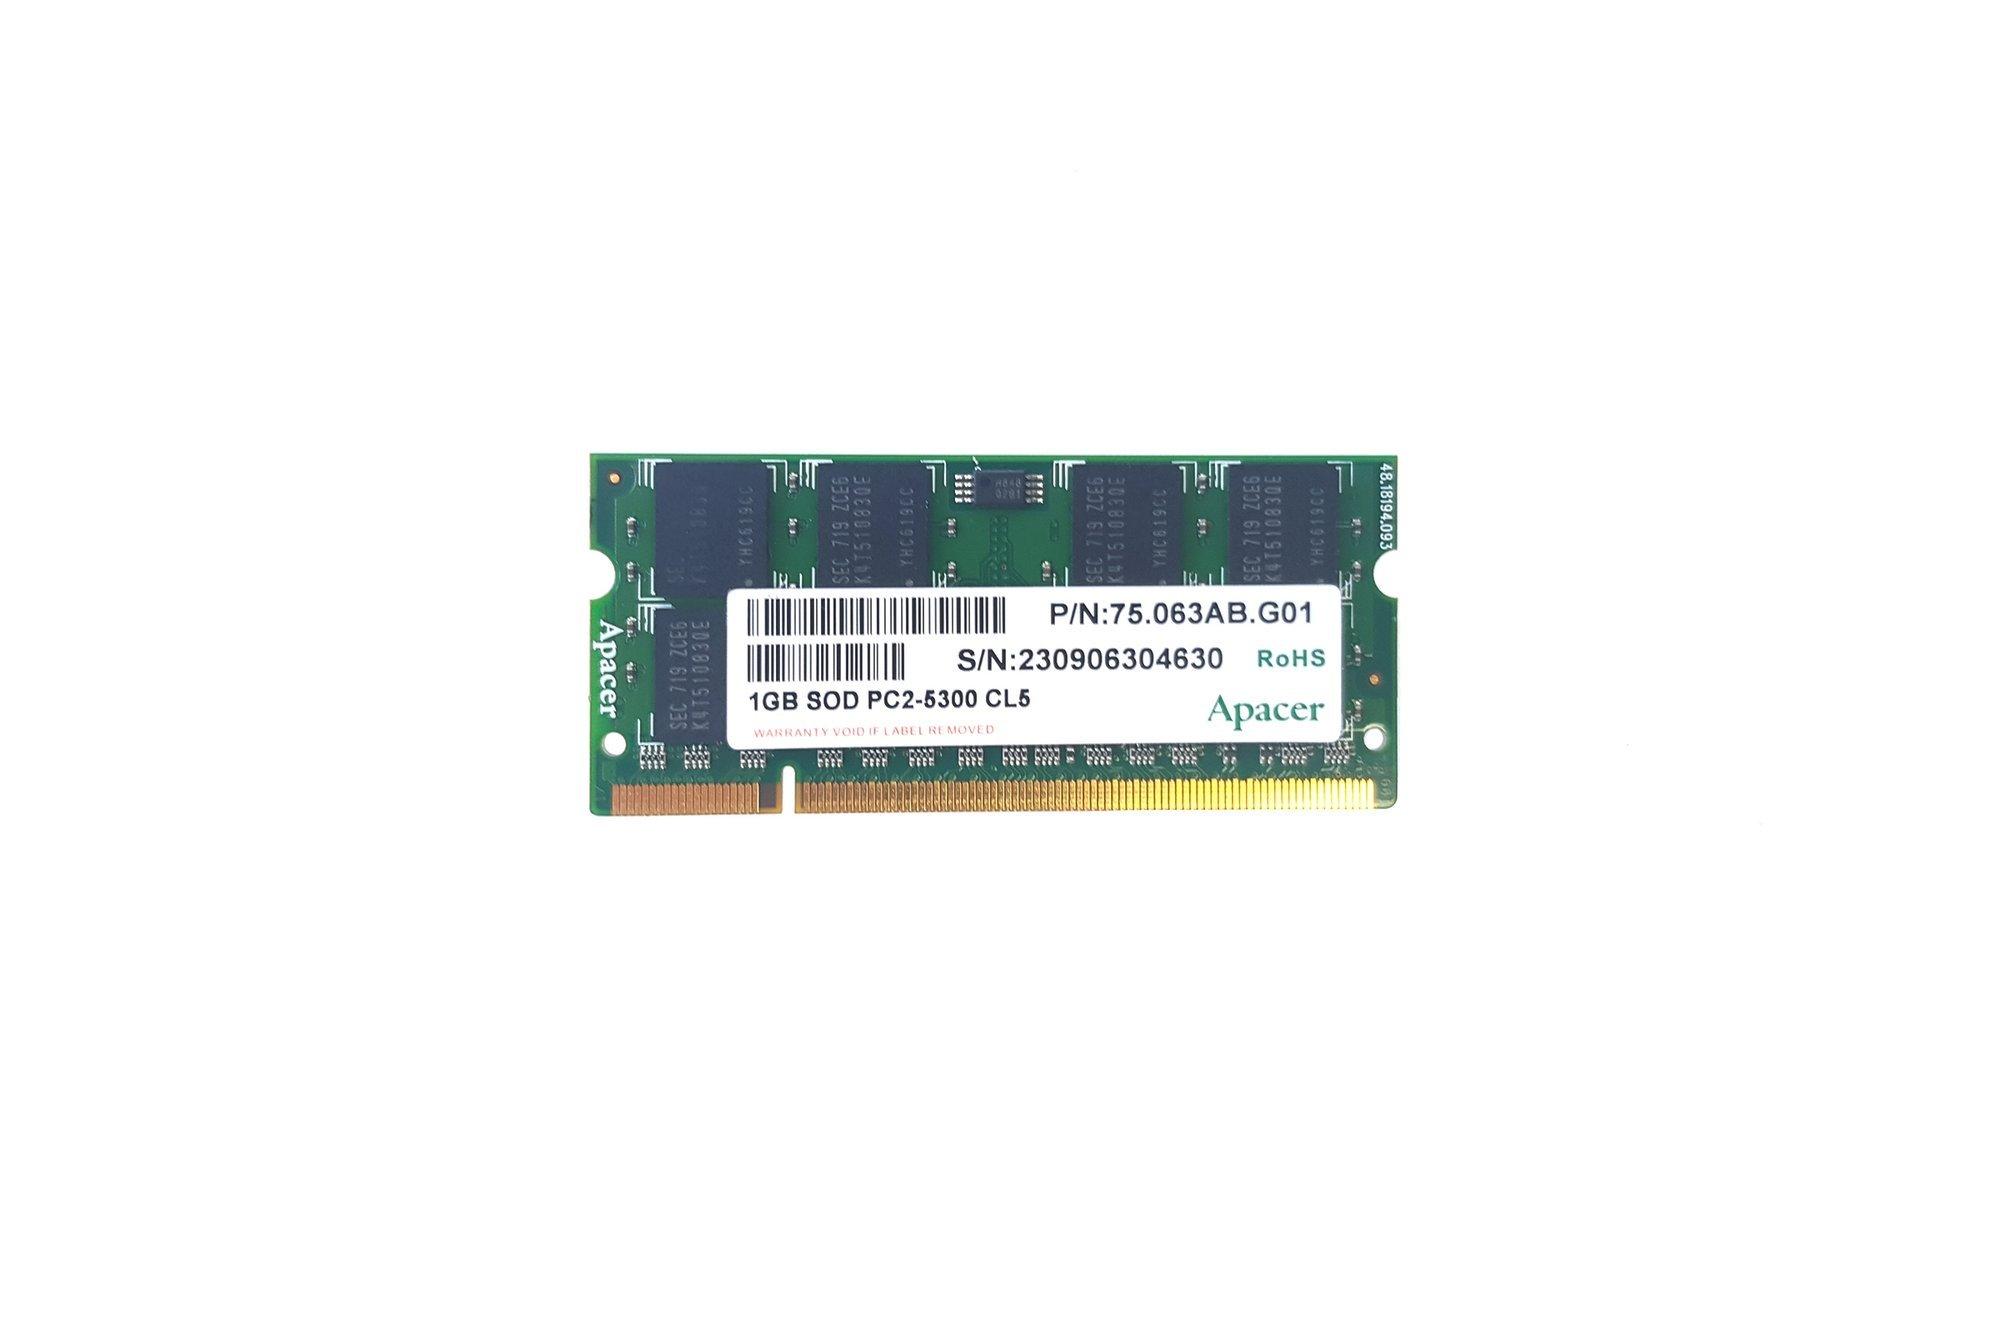 SODIMM Memory RAM Apacer 1GB DDR2 75.063AB.G01